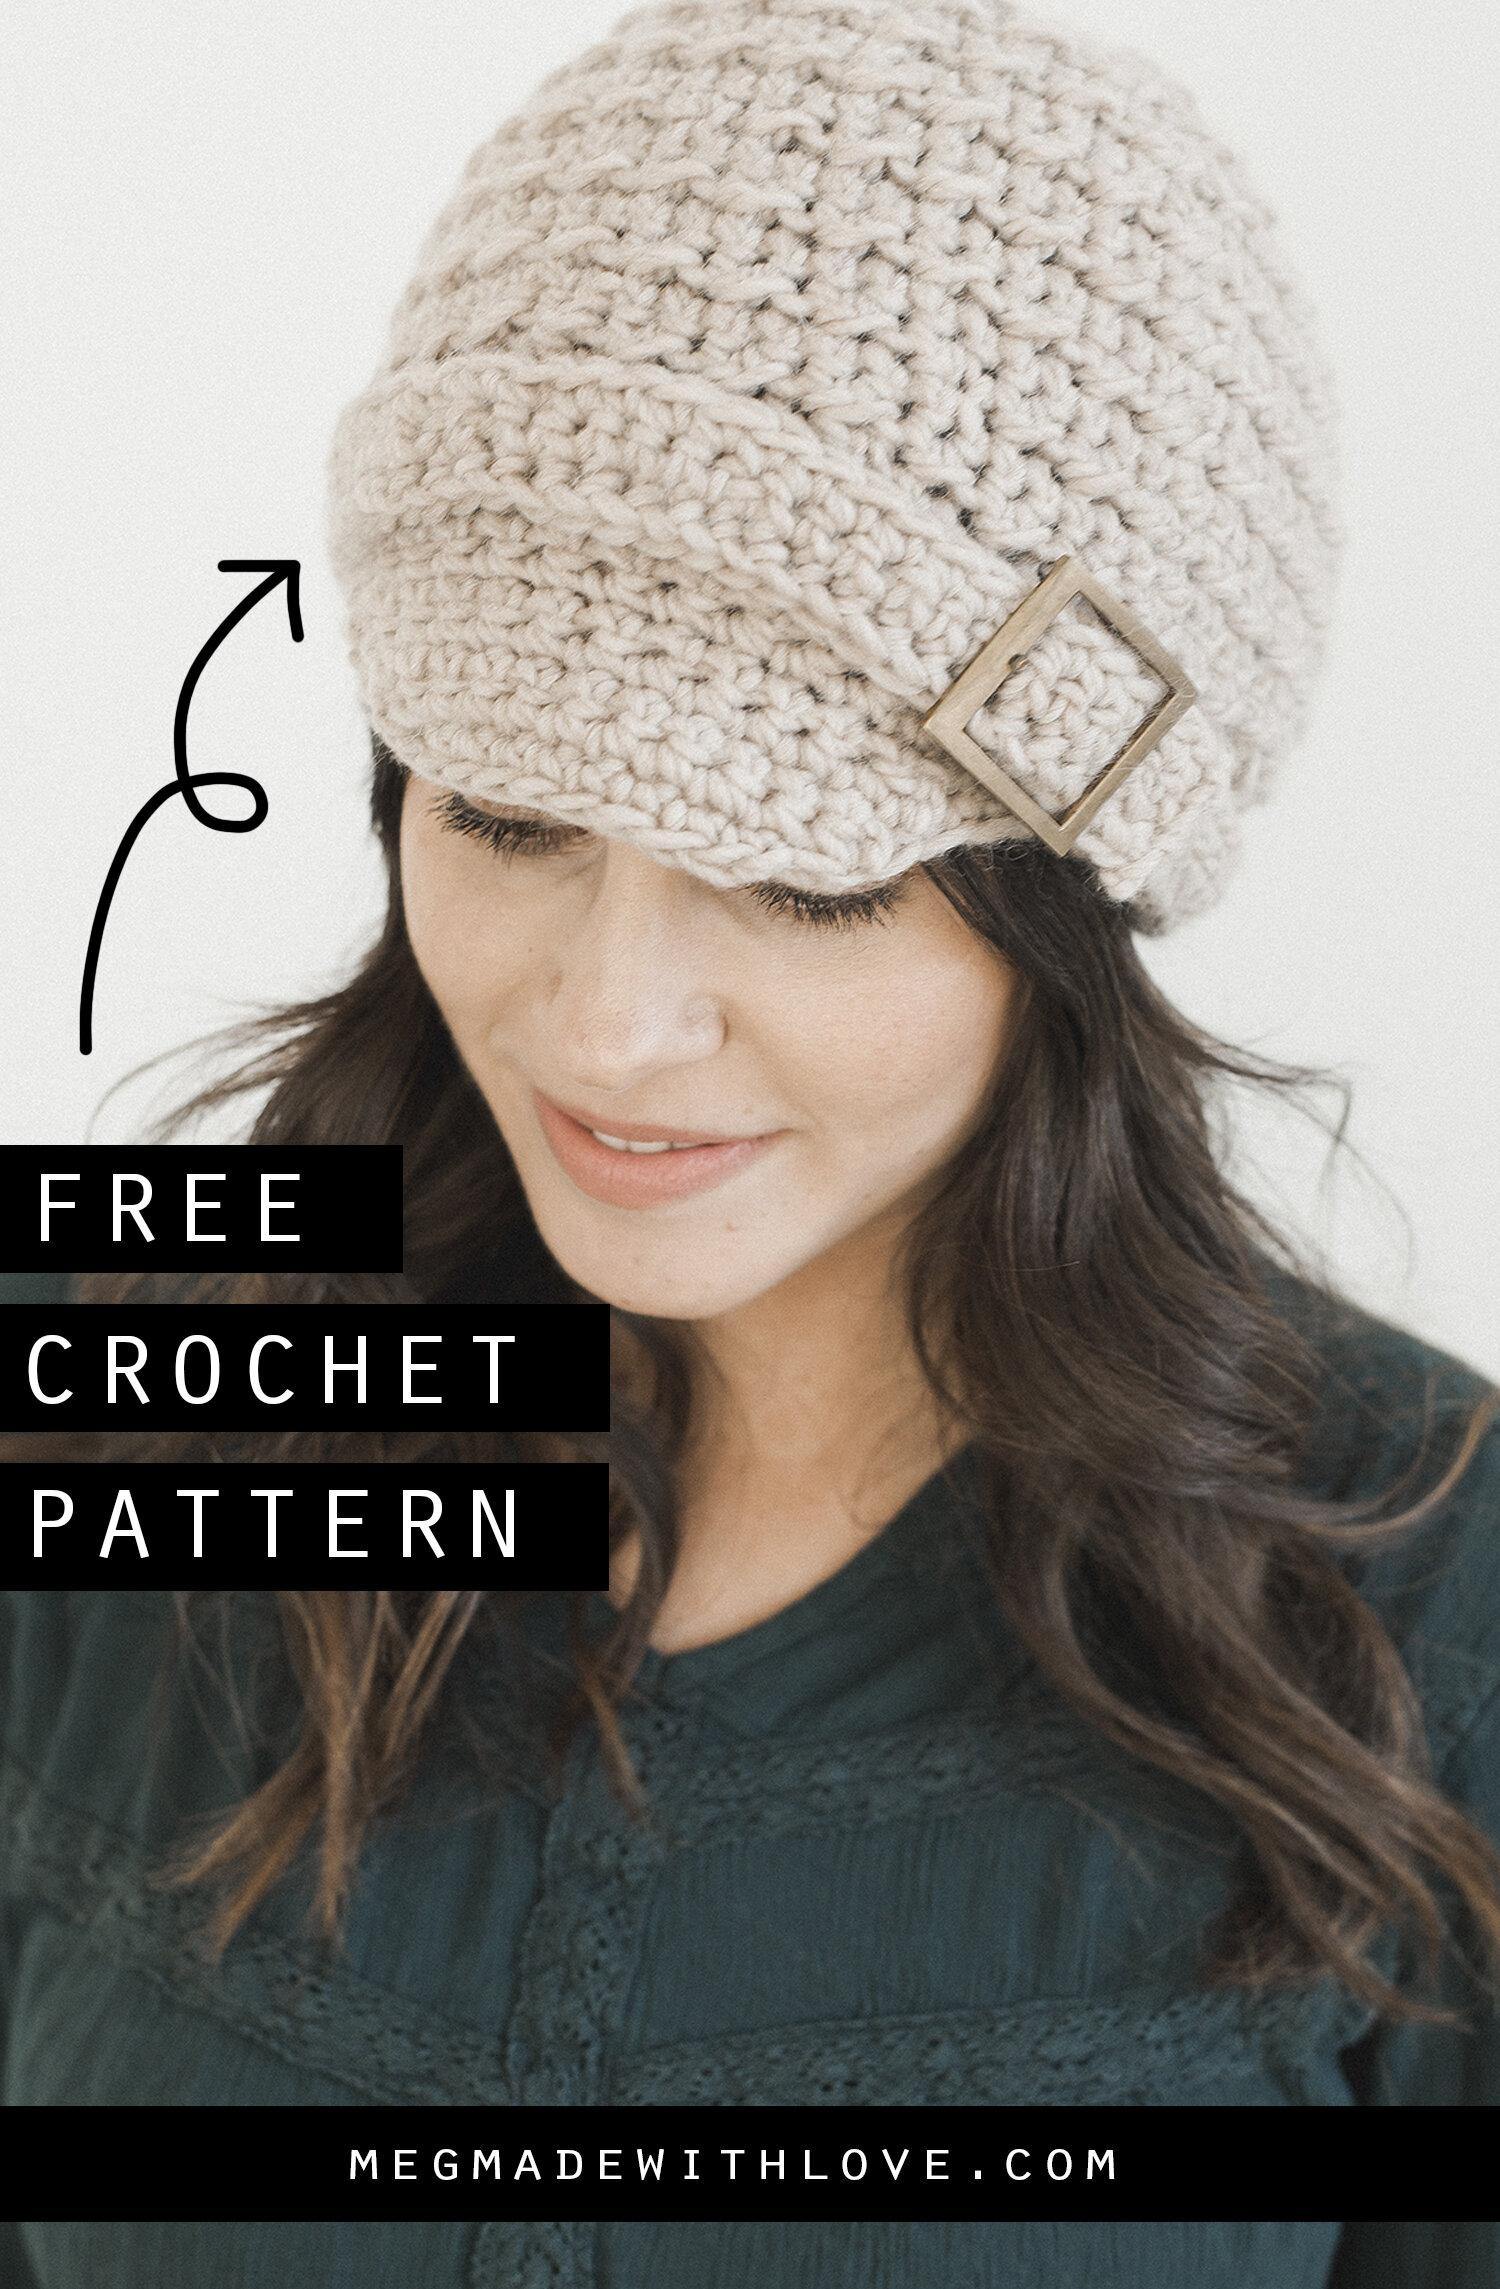 Crochet Maketopin.com - Amigurumi Free Crochet Patterns and Tutorials   1526x1000